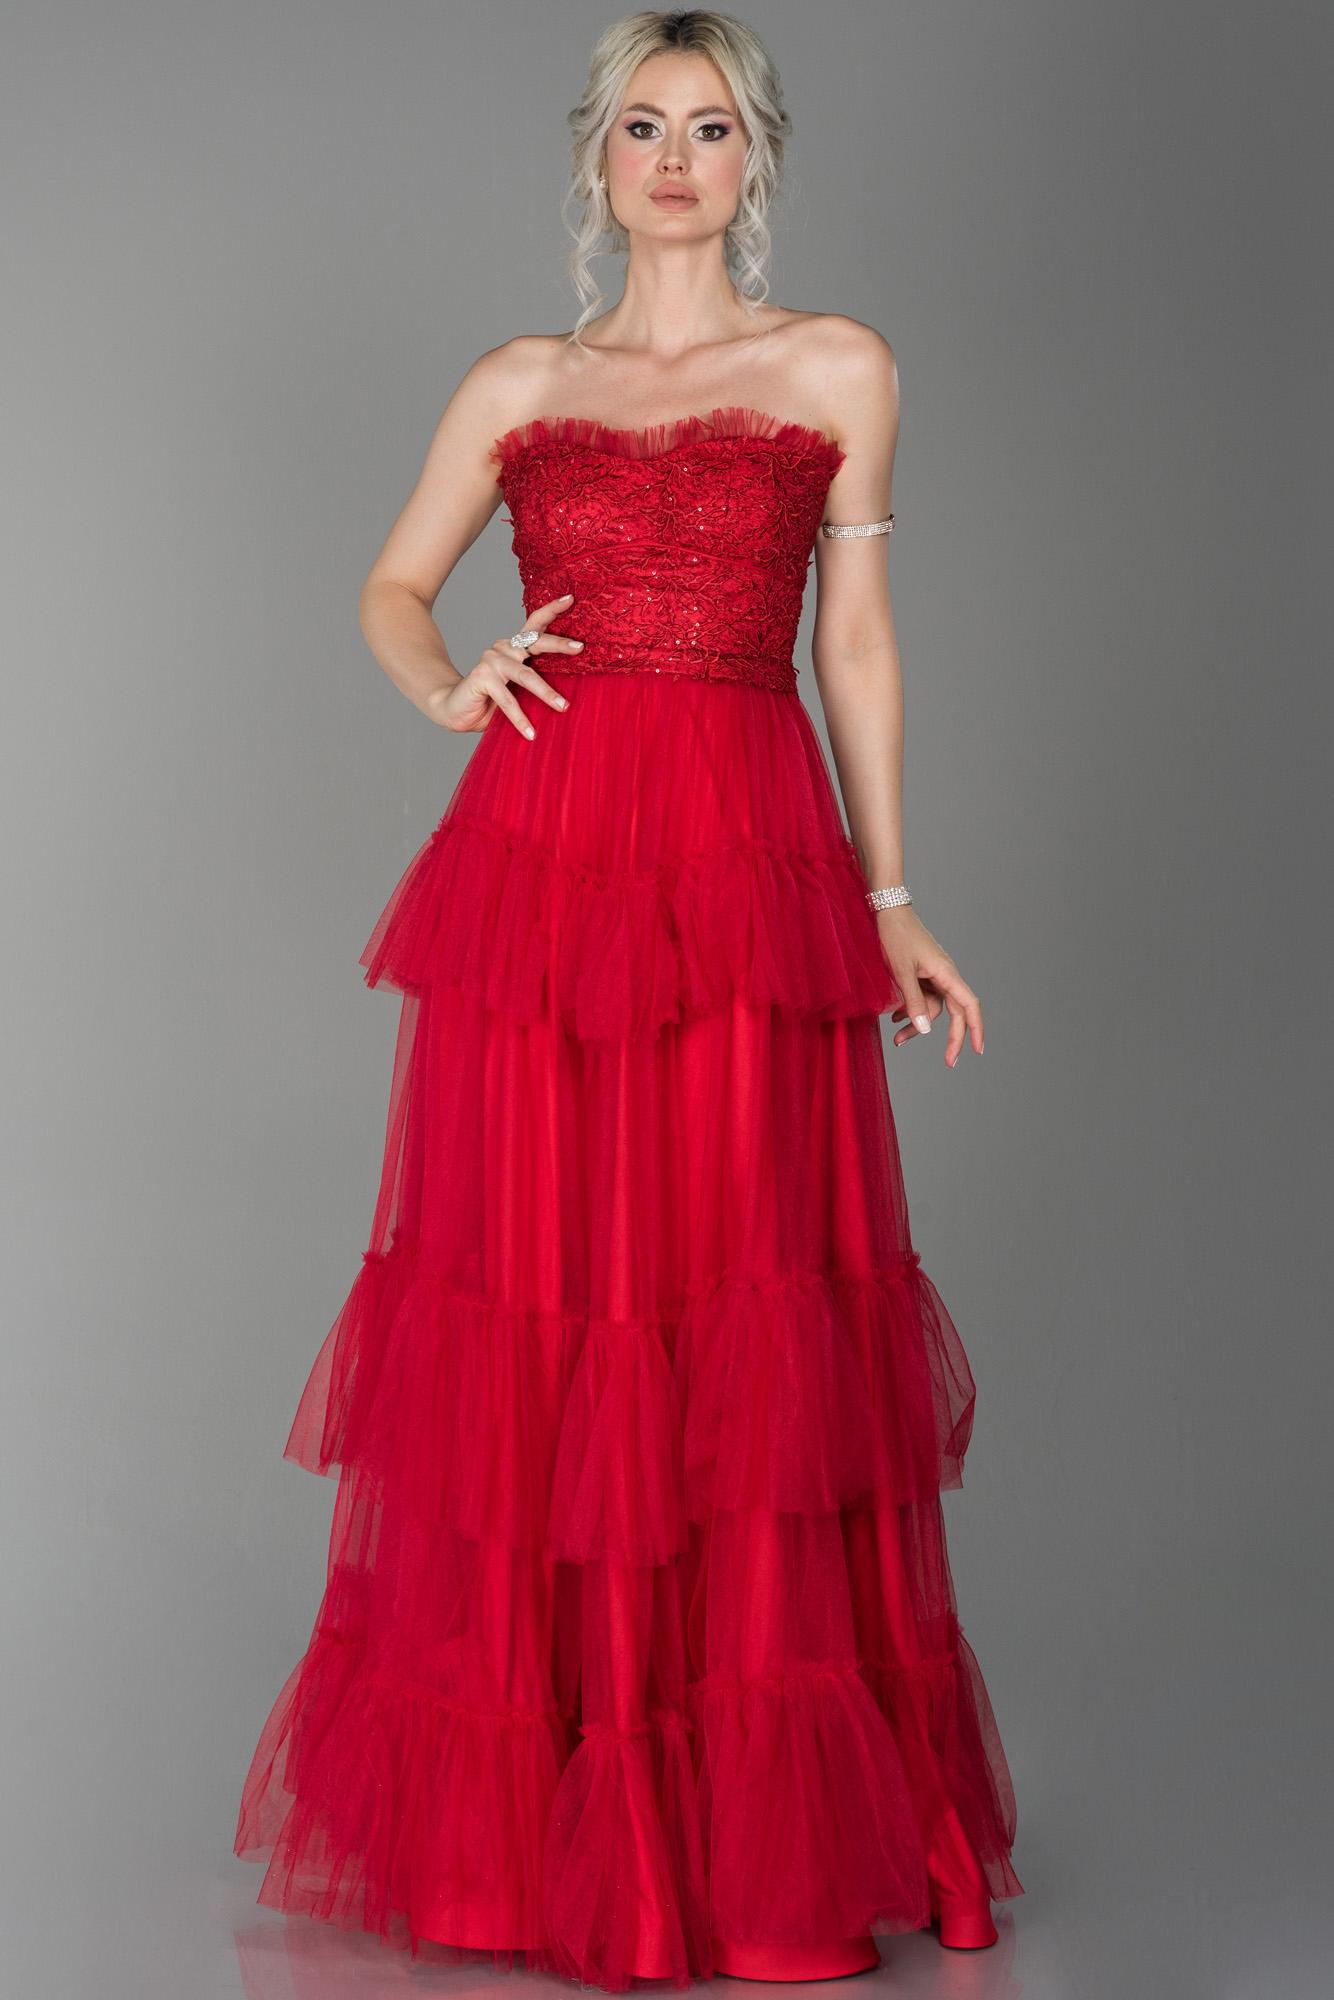 Kırmızı Straplez Kat Kat Tül Detaylı Prenses Abiye